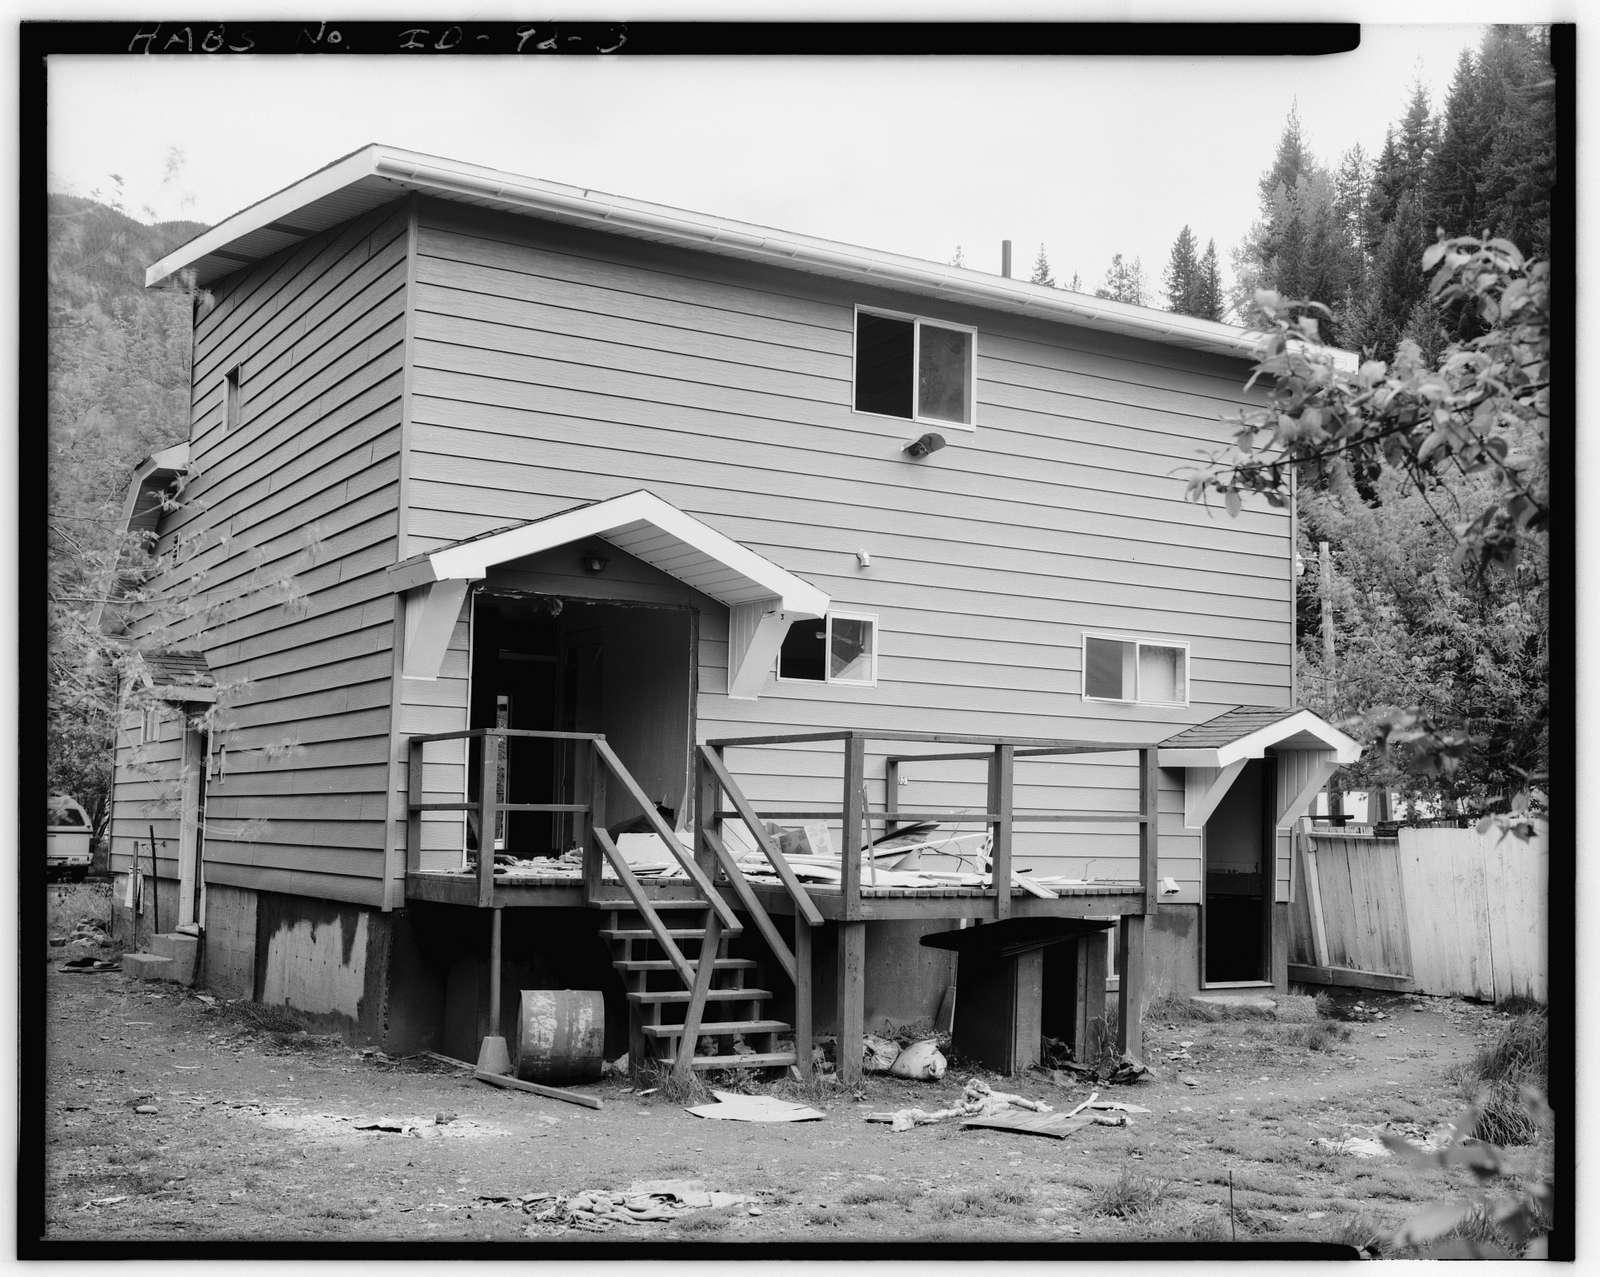 Leonard A. Johnson House, 8 Spruce Street, Wallace, Shoshone County, ID